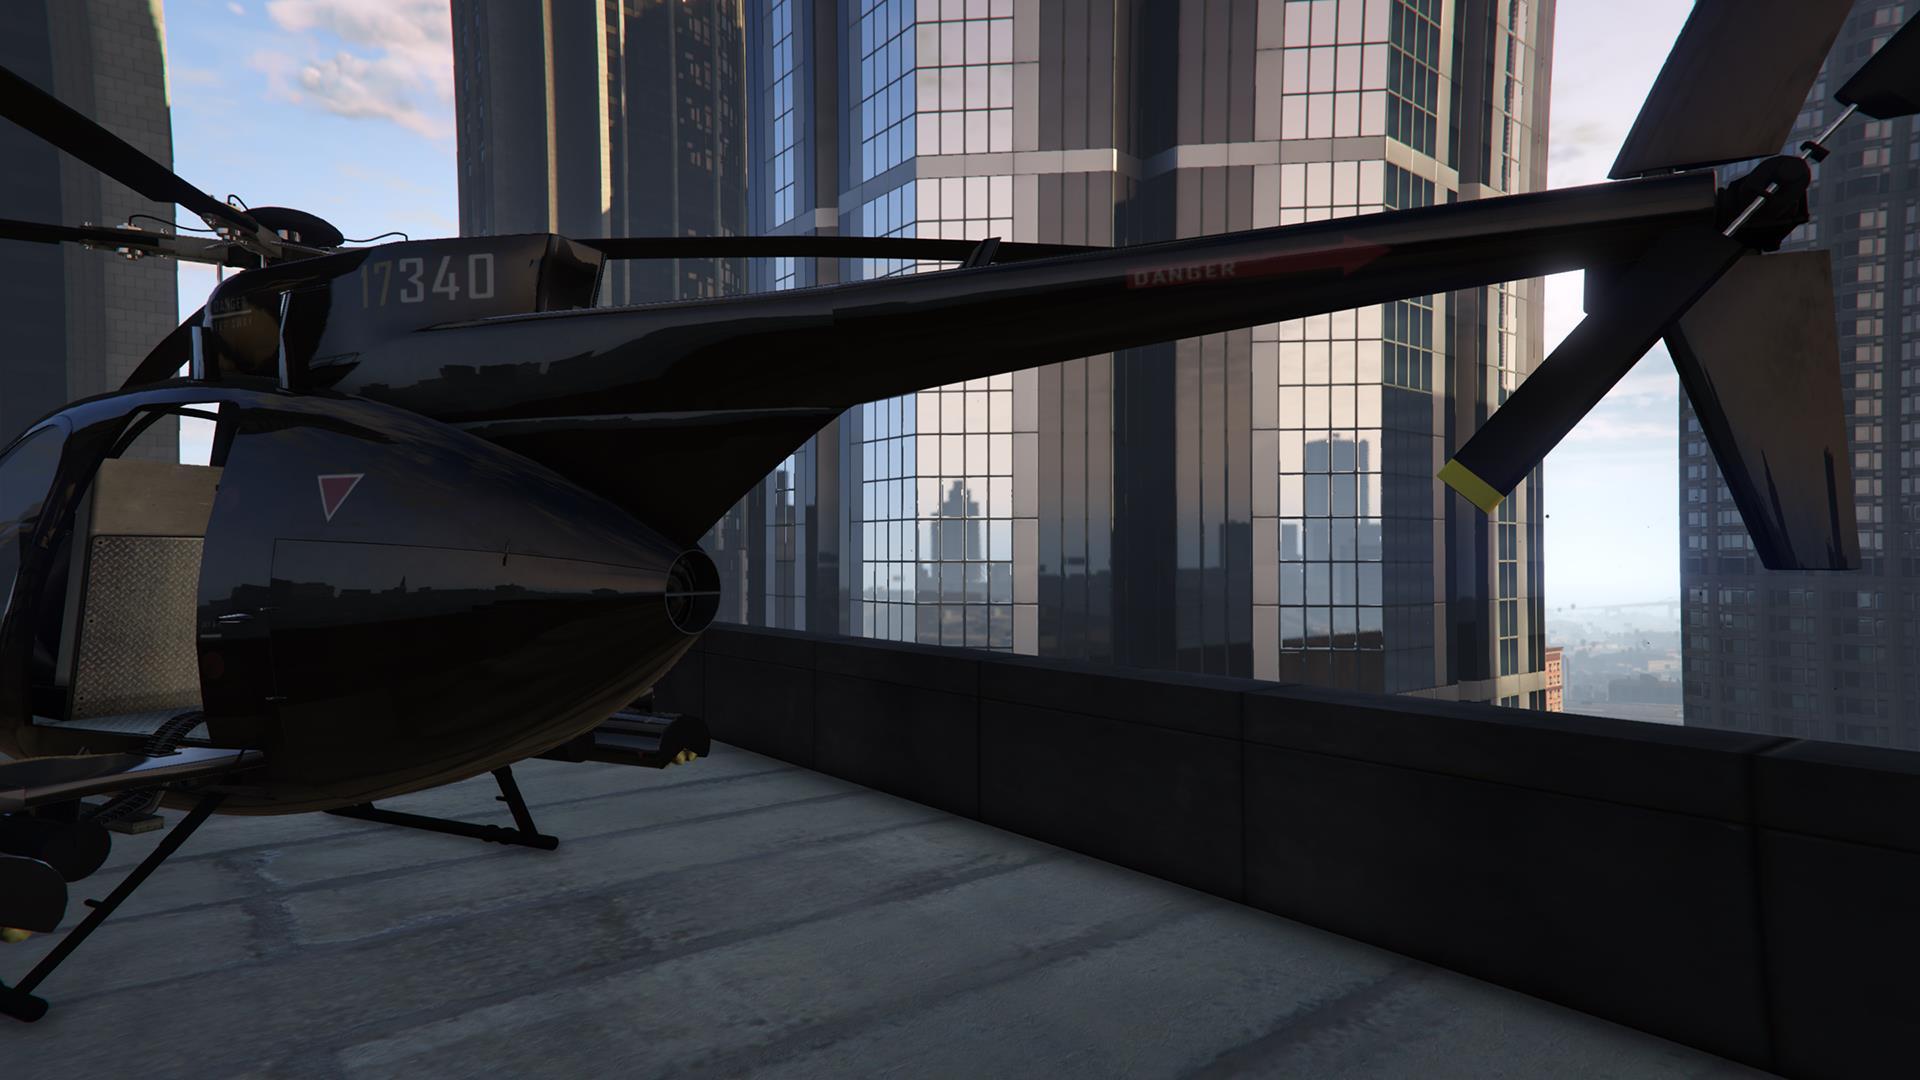 Качество отражений GTA 5